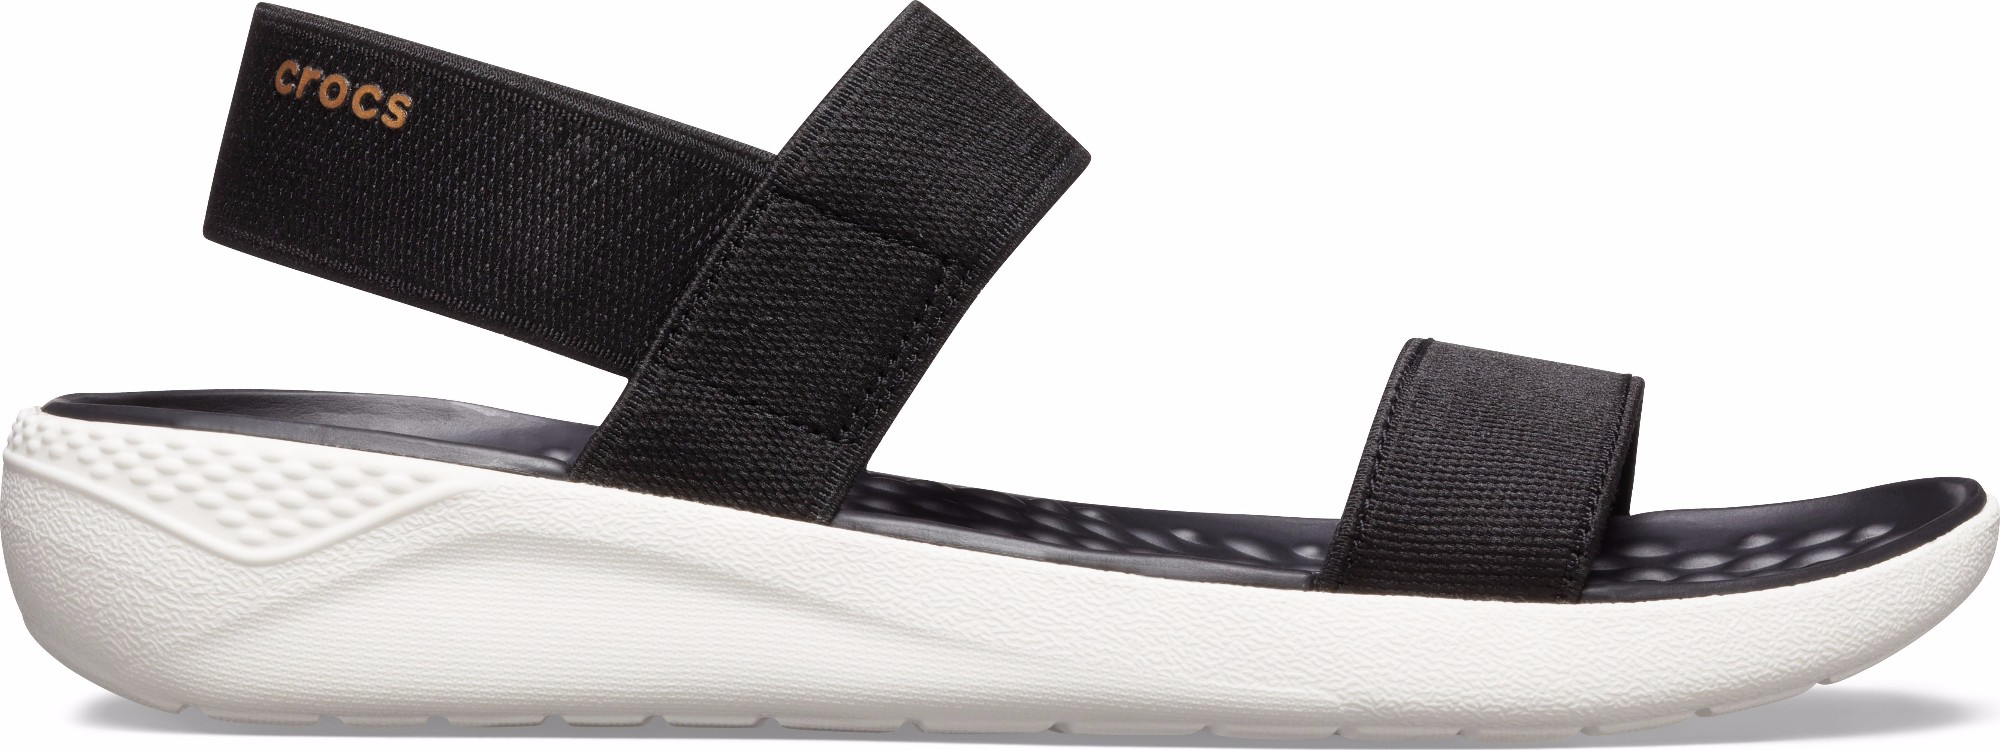 70844cf131 Crocs™ Women s LiteRide Sandal Black White ...